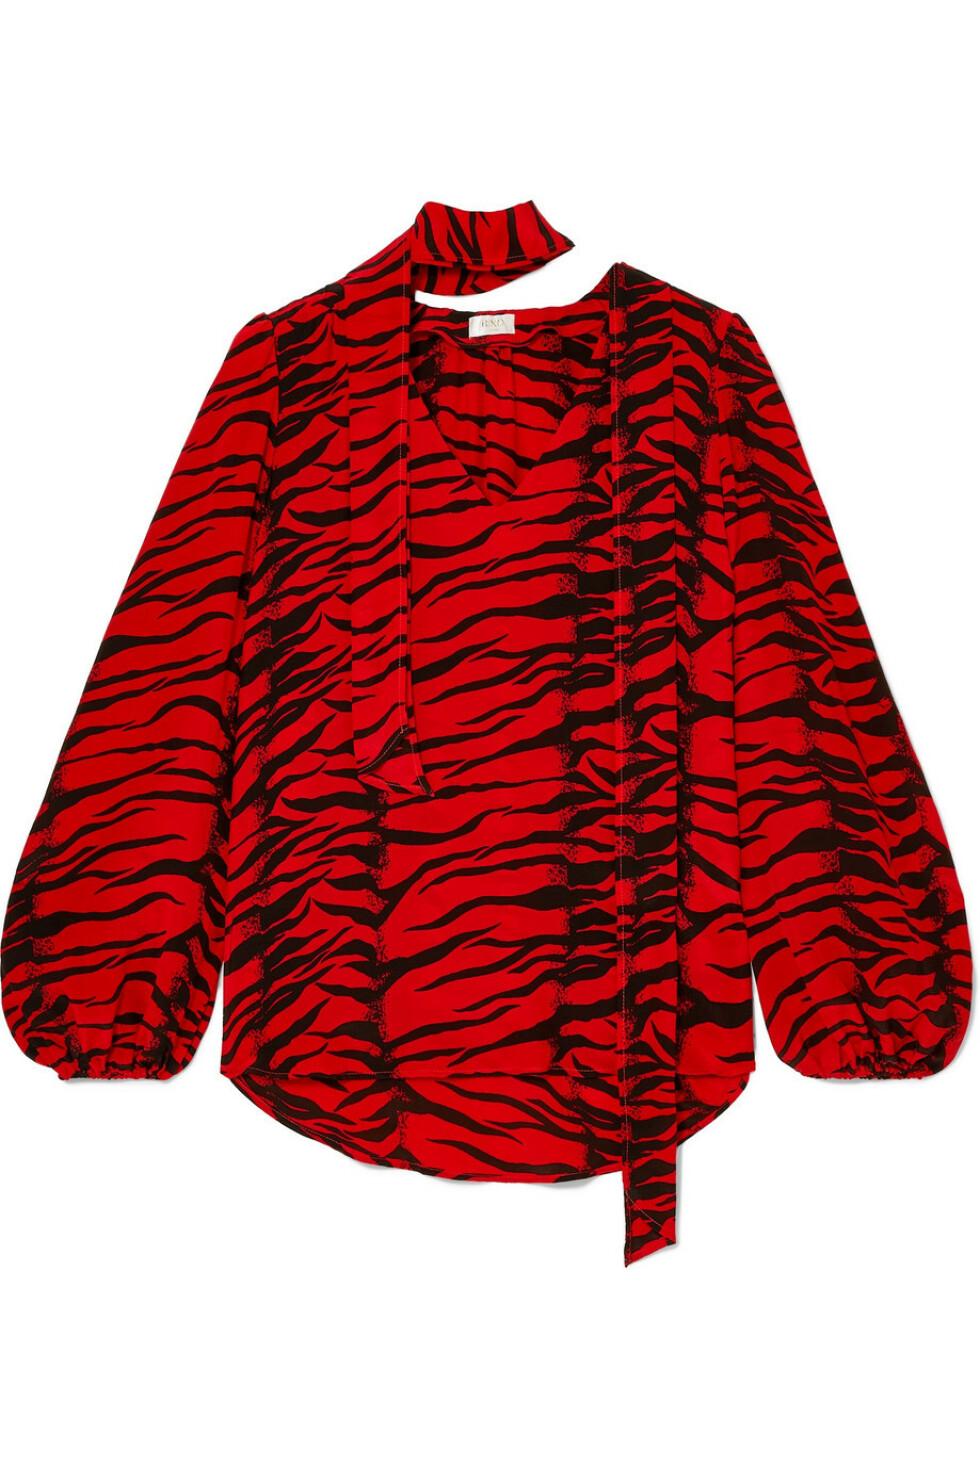 Overdel fra Rixo |2200,-| https://www.net-a-porter.com/no/en/product/1110750/rixo/moss-pussy-bow-tiger-print-silk-crepe-blouse